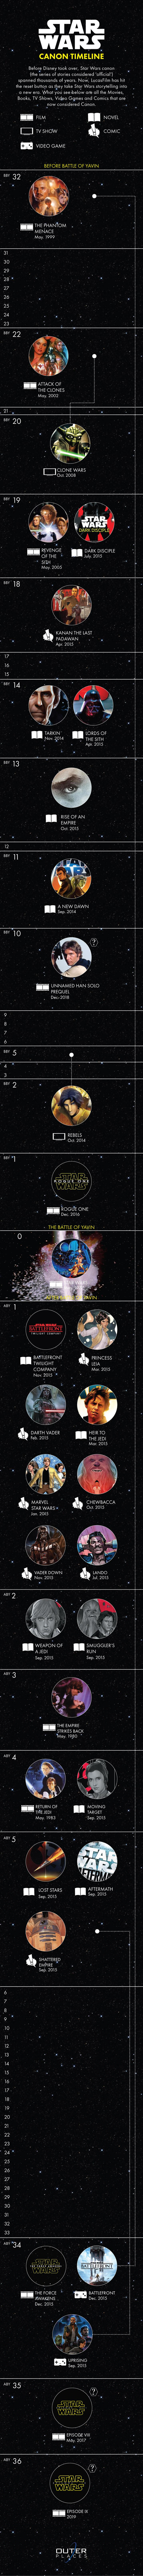 star_wars_canon_timeline